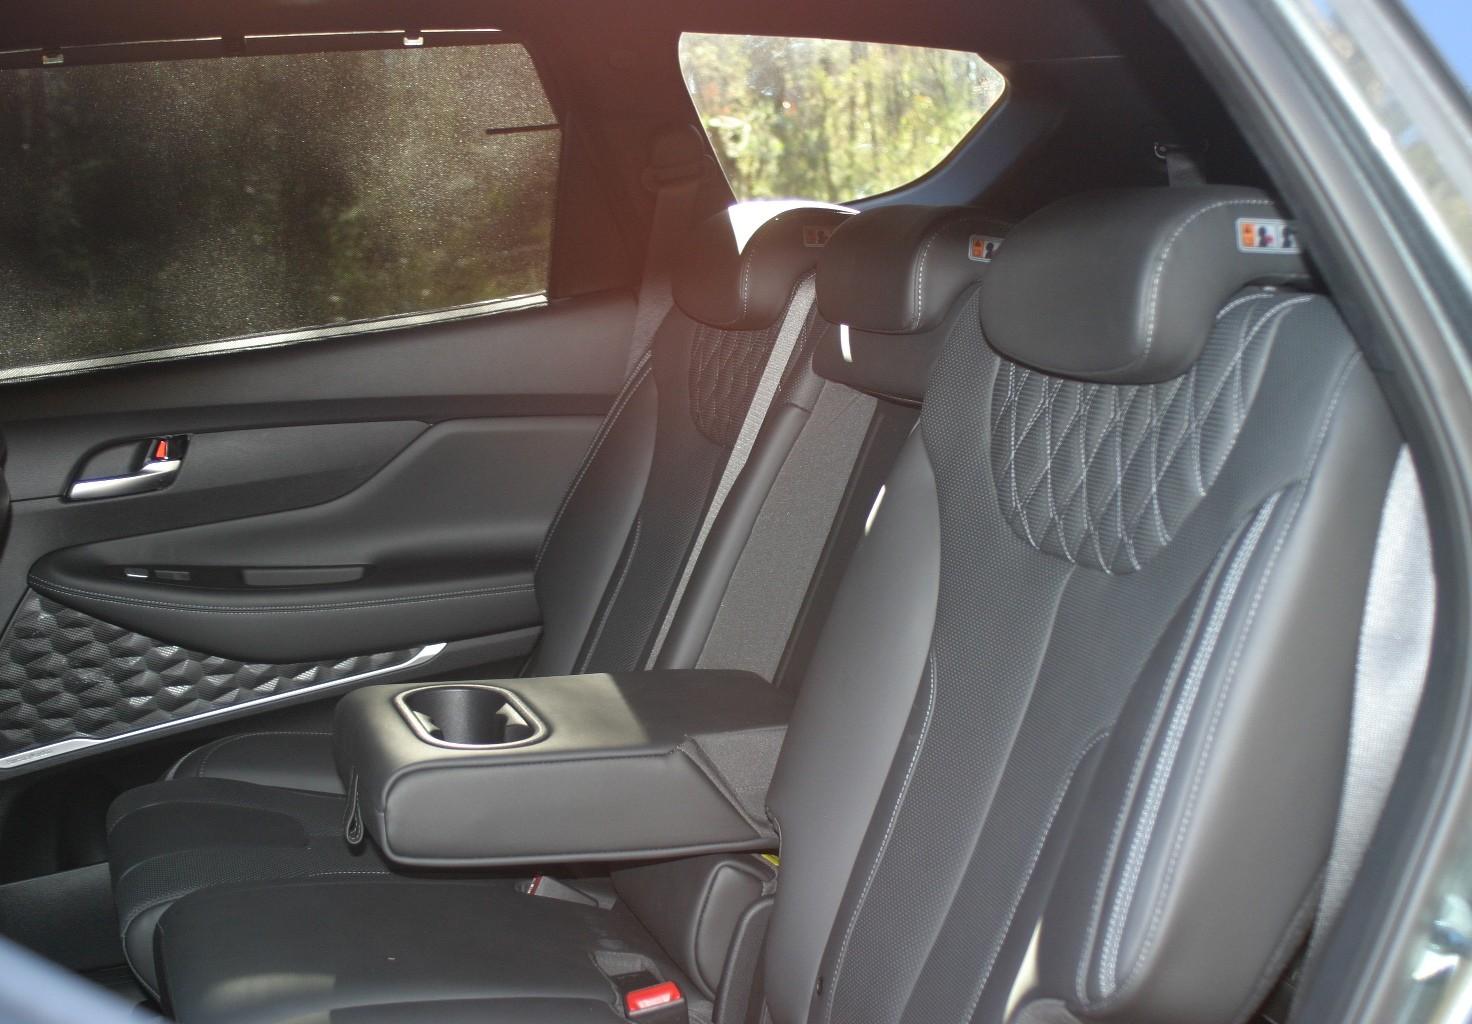 Hyundai Santa Fe Highlander V6 Petrol second row seats